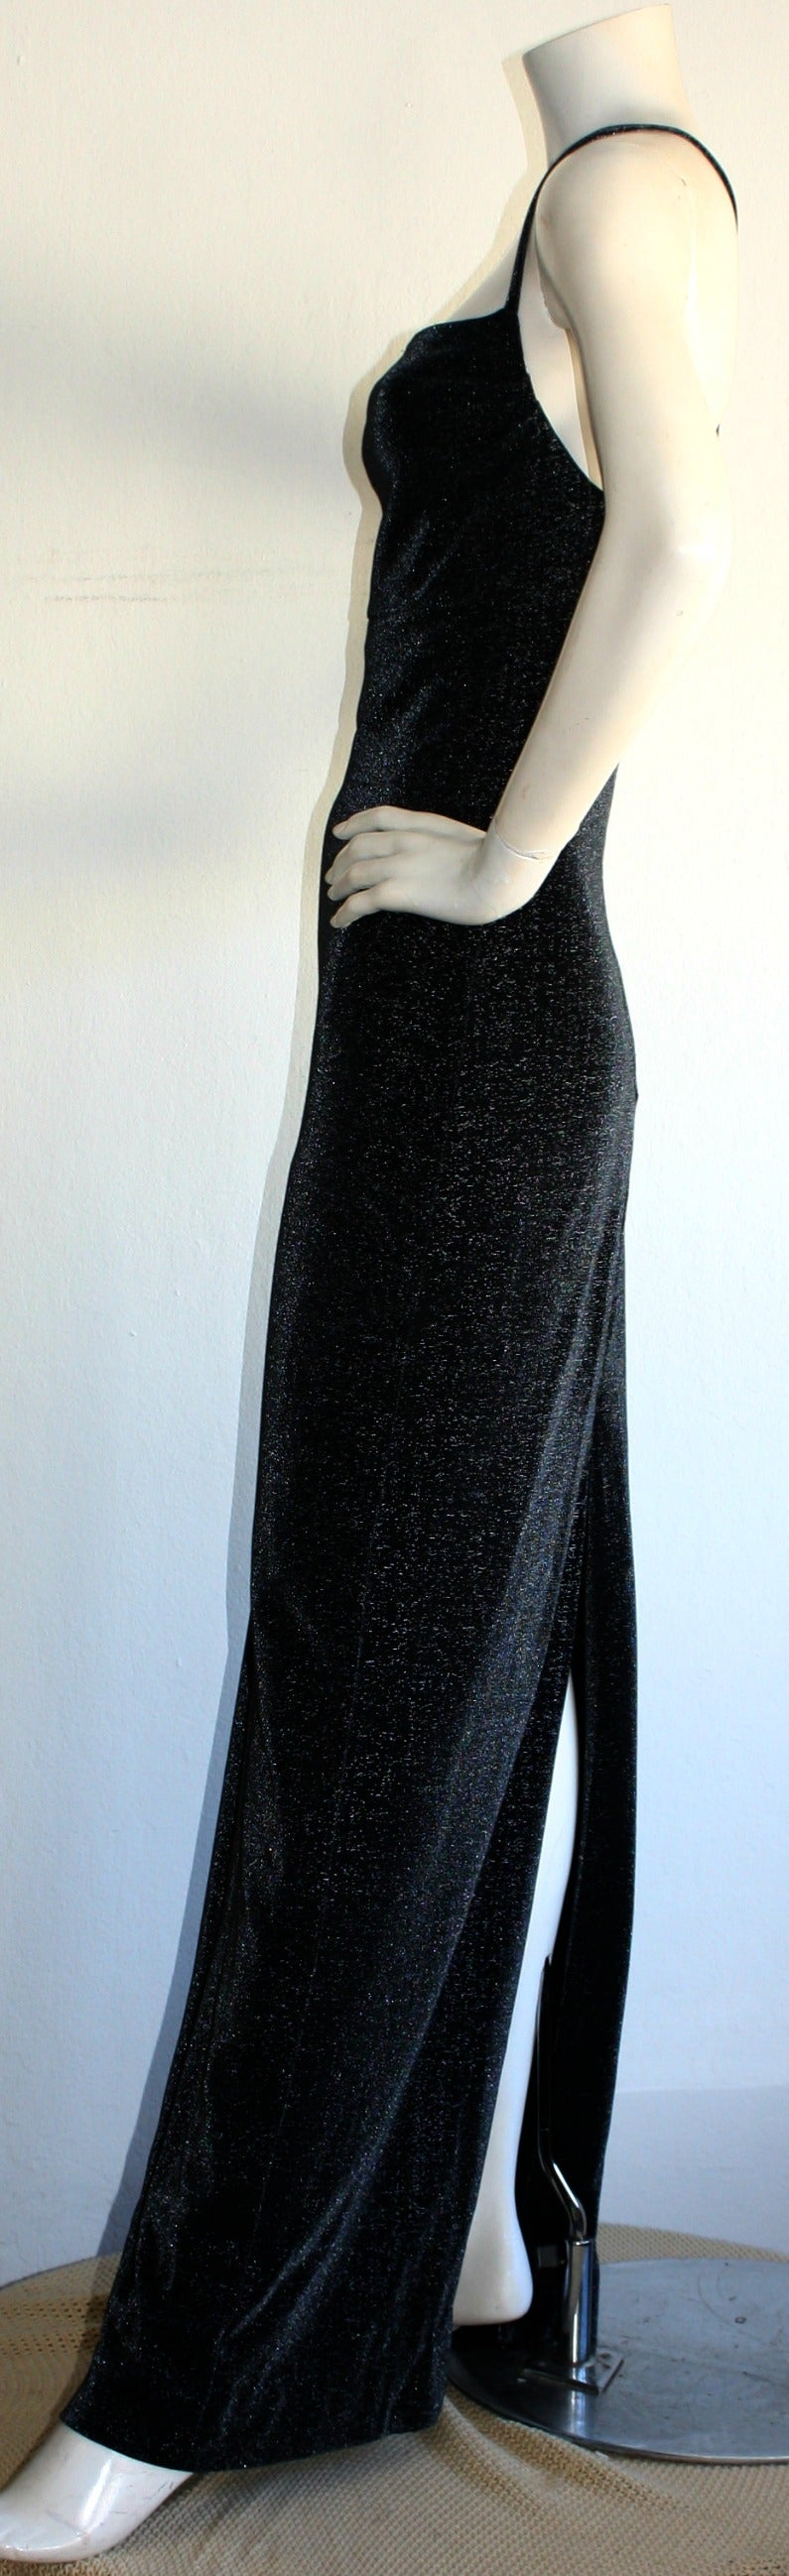 1990s Vintage Gianni Versace Pre-Death Versus Silver Metallic Criss Cross Gown For Sale 2